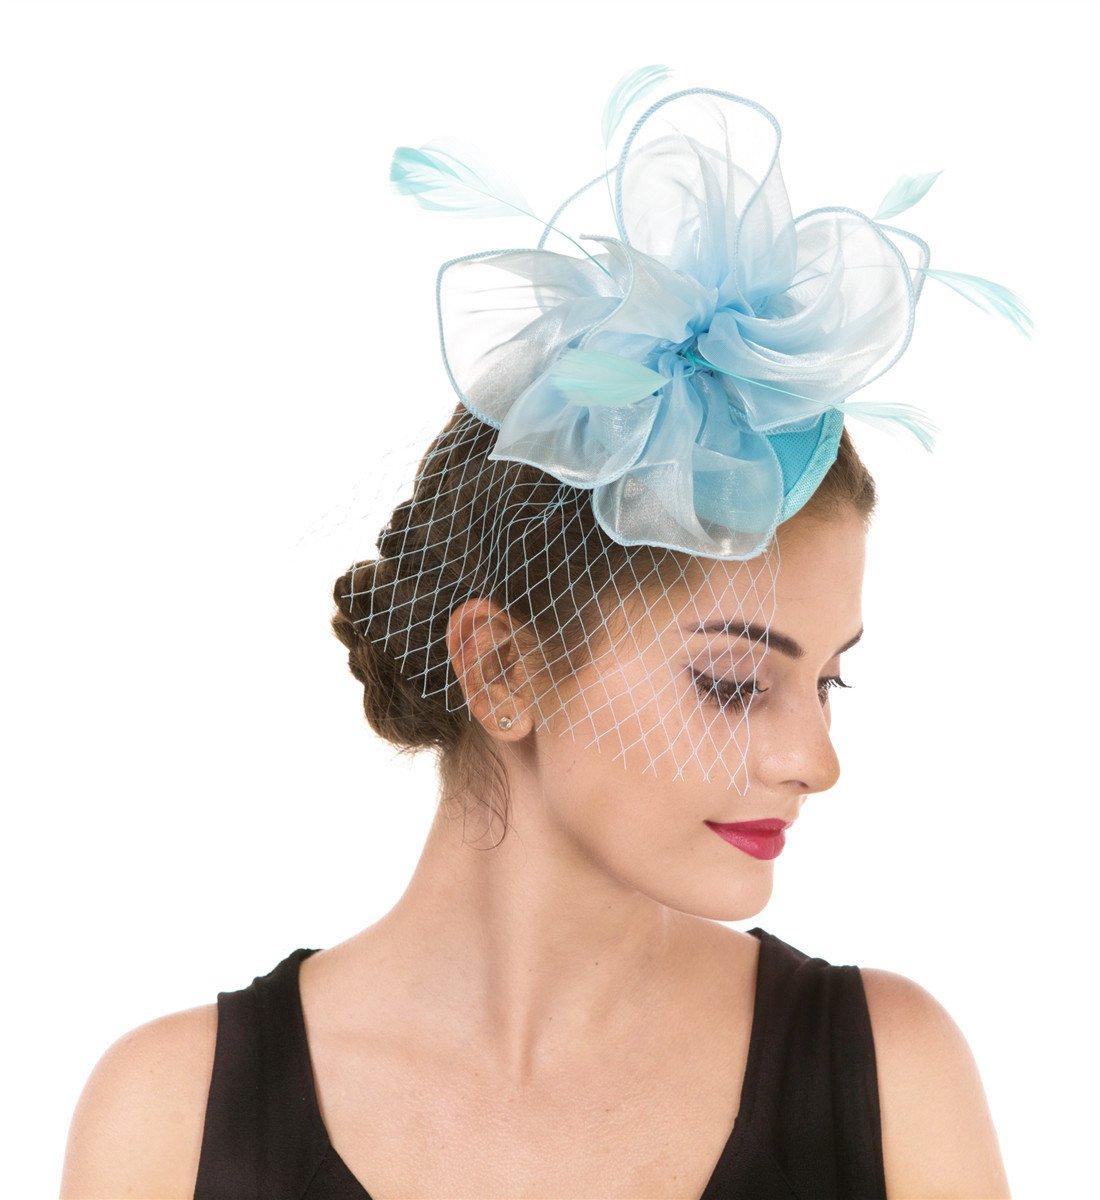 SAFERIN Fascinators Hat for Women Tea Party Headband Kentucky Derby Wedding Cocktail Flower Mesh Feathers Hair Clip (TA2-Light Blue)